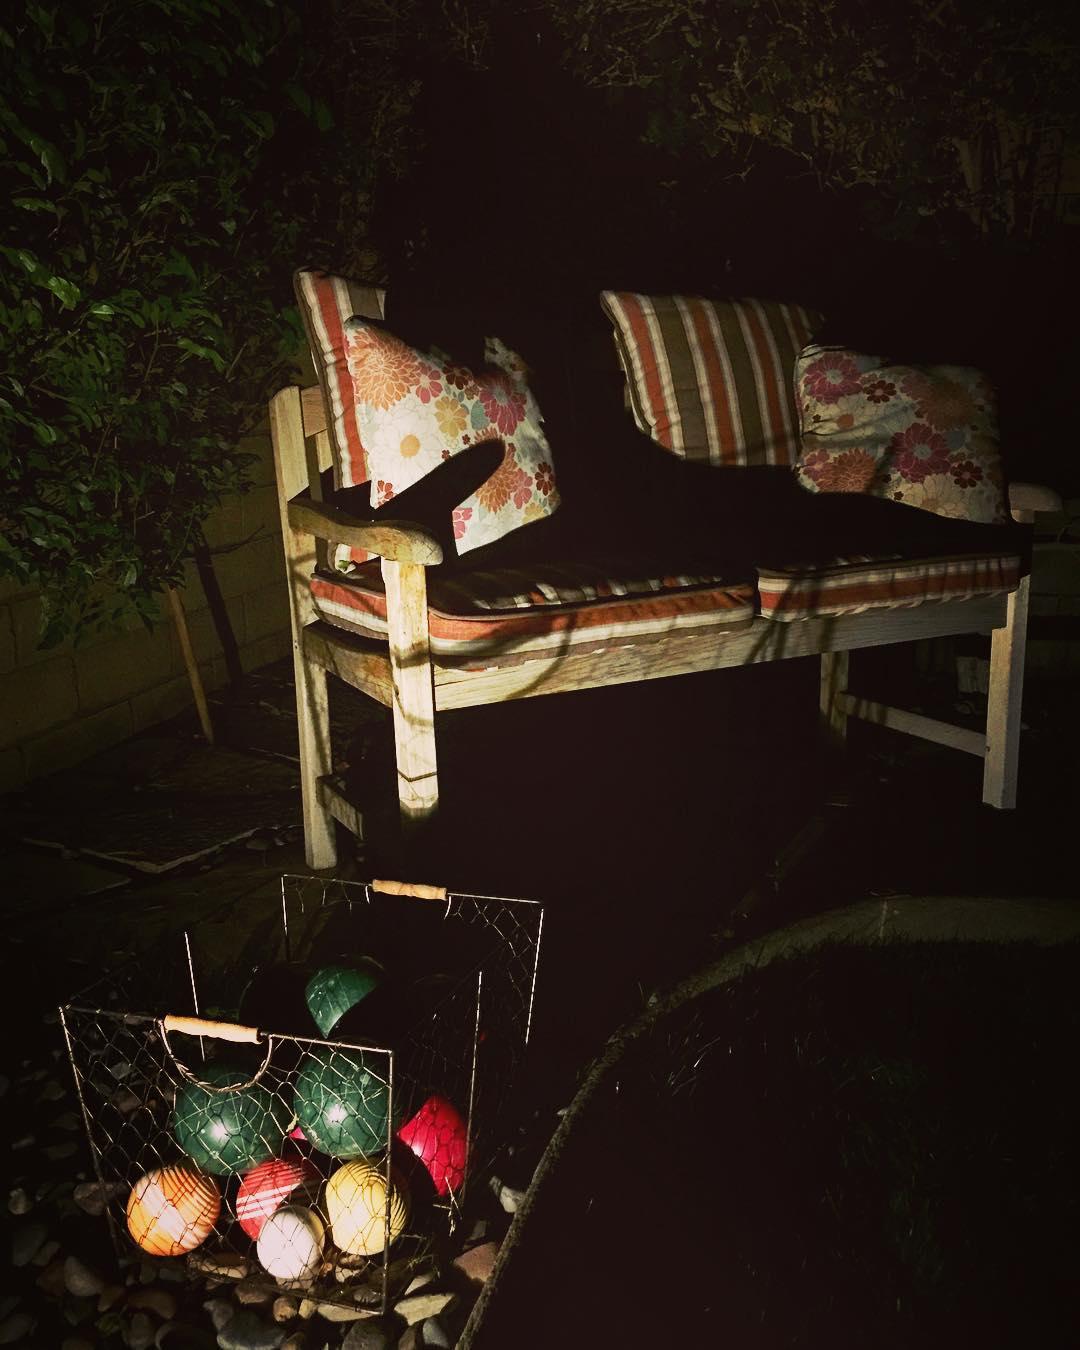 My Los Angeles 16 – In The Night Garden via Instagram